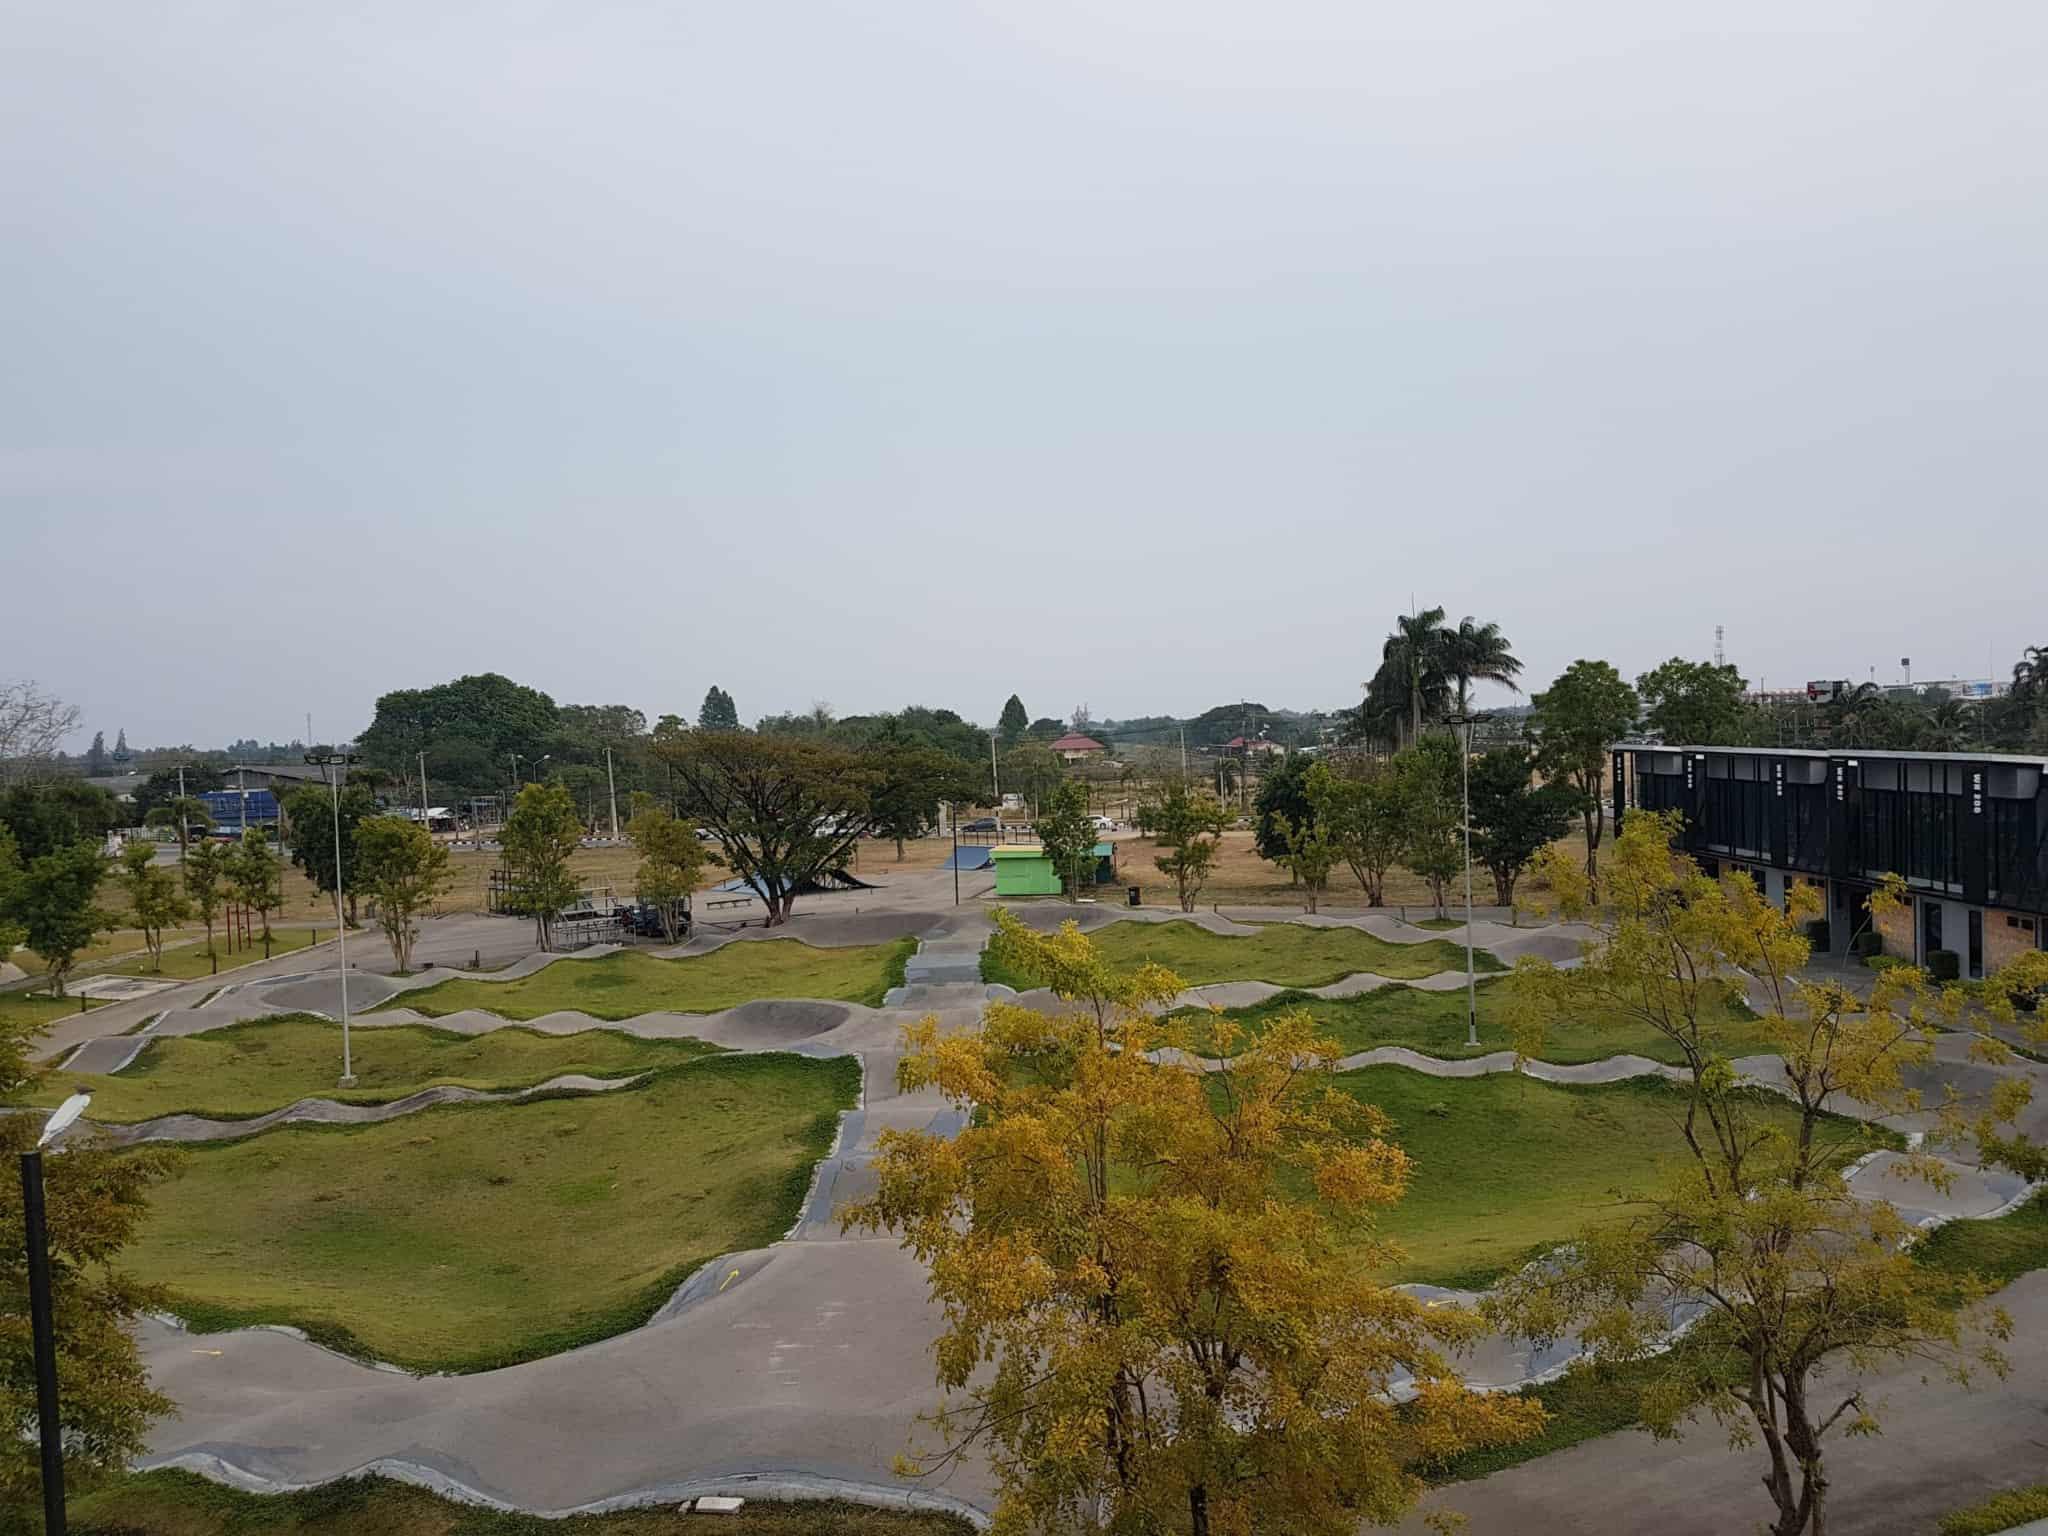 Thaïlande, quand tu deviens la star d'un évènement Suzuki ⭐ 16